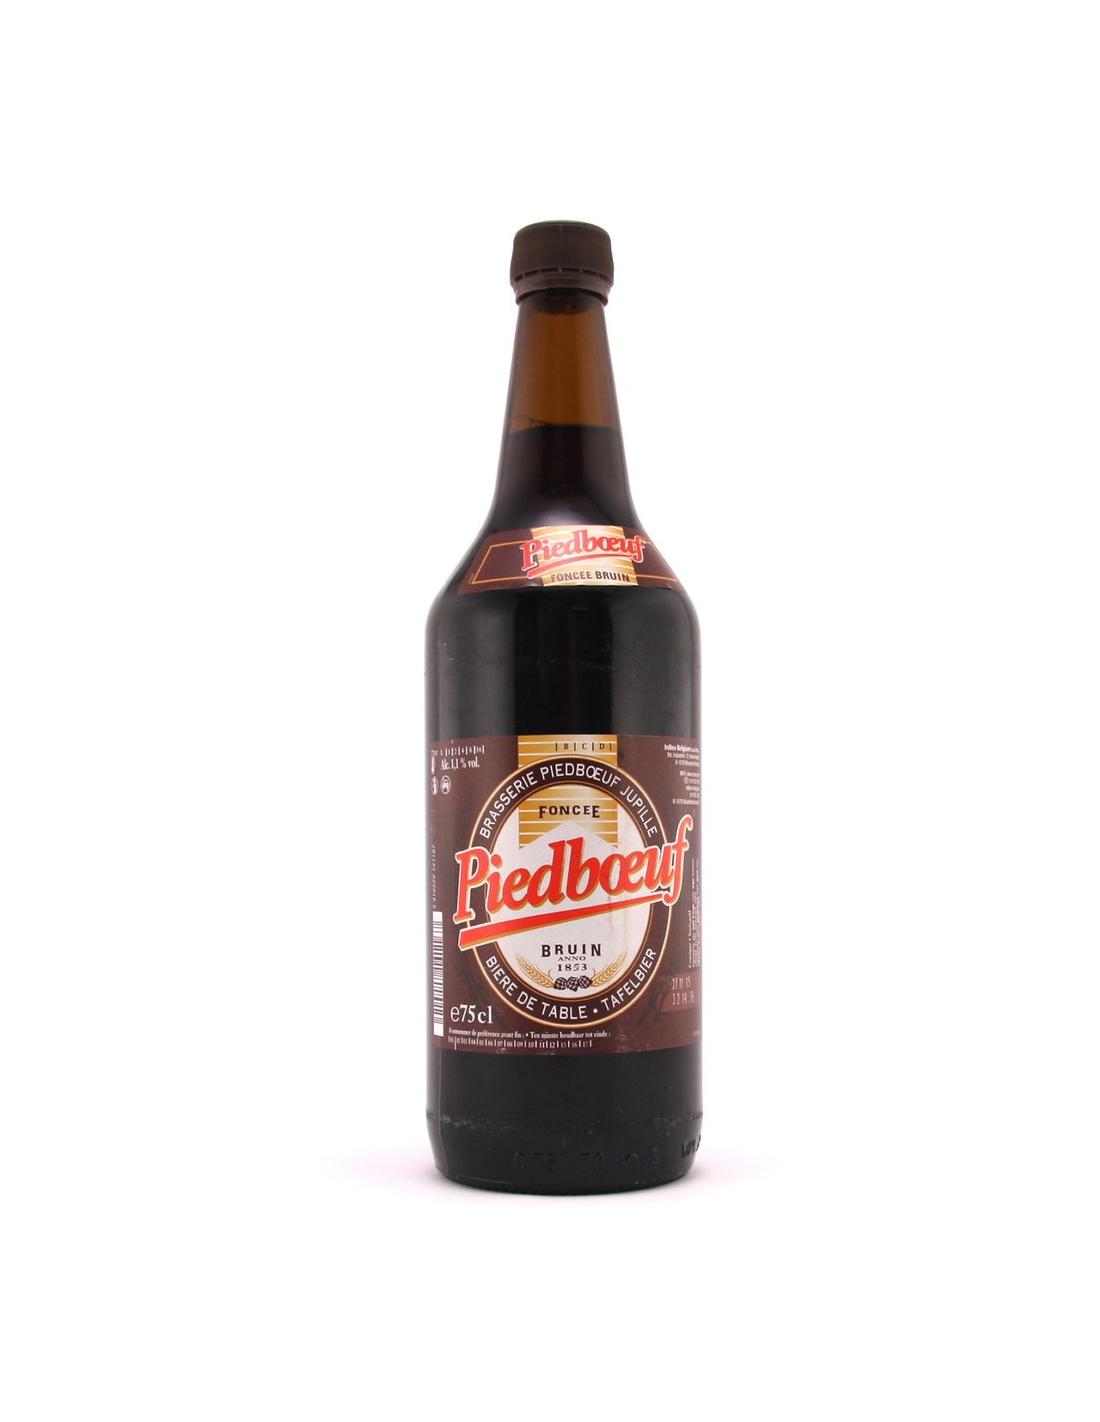 Bere bruna Piedboeuf Foncee, 1.1% alc., 0.75L, Belgia